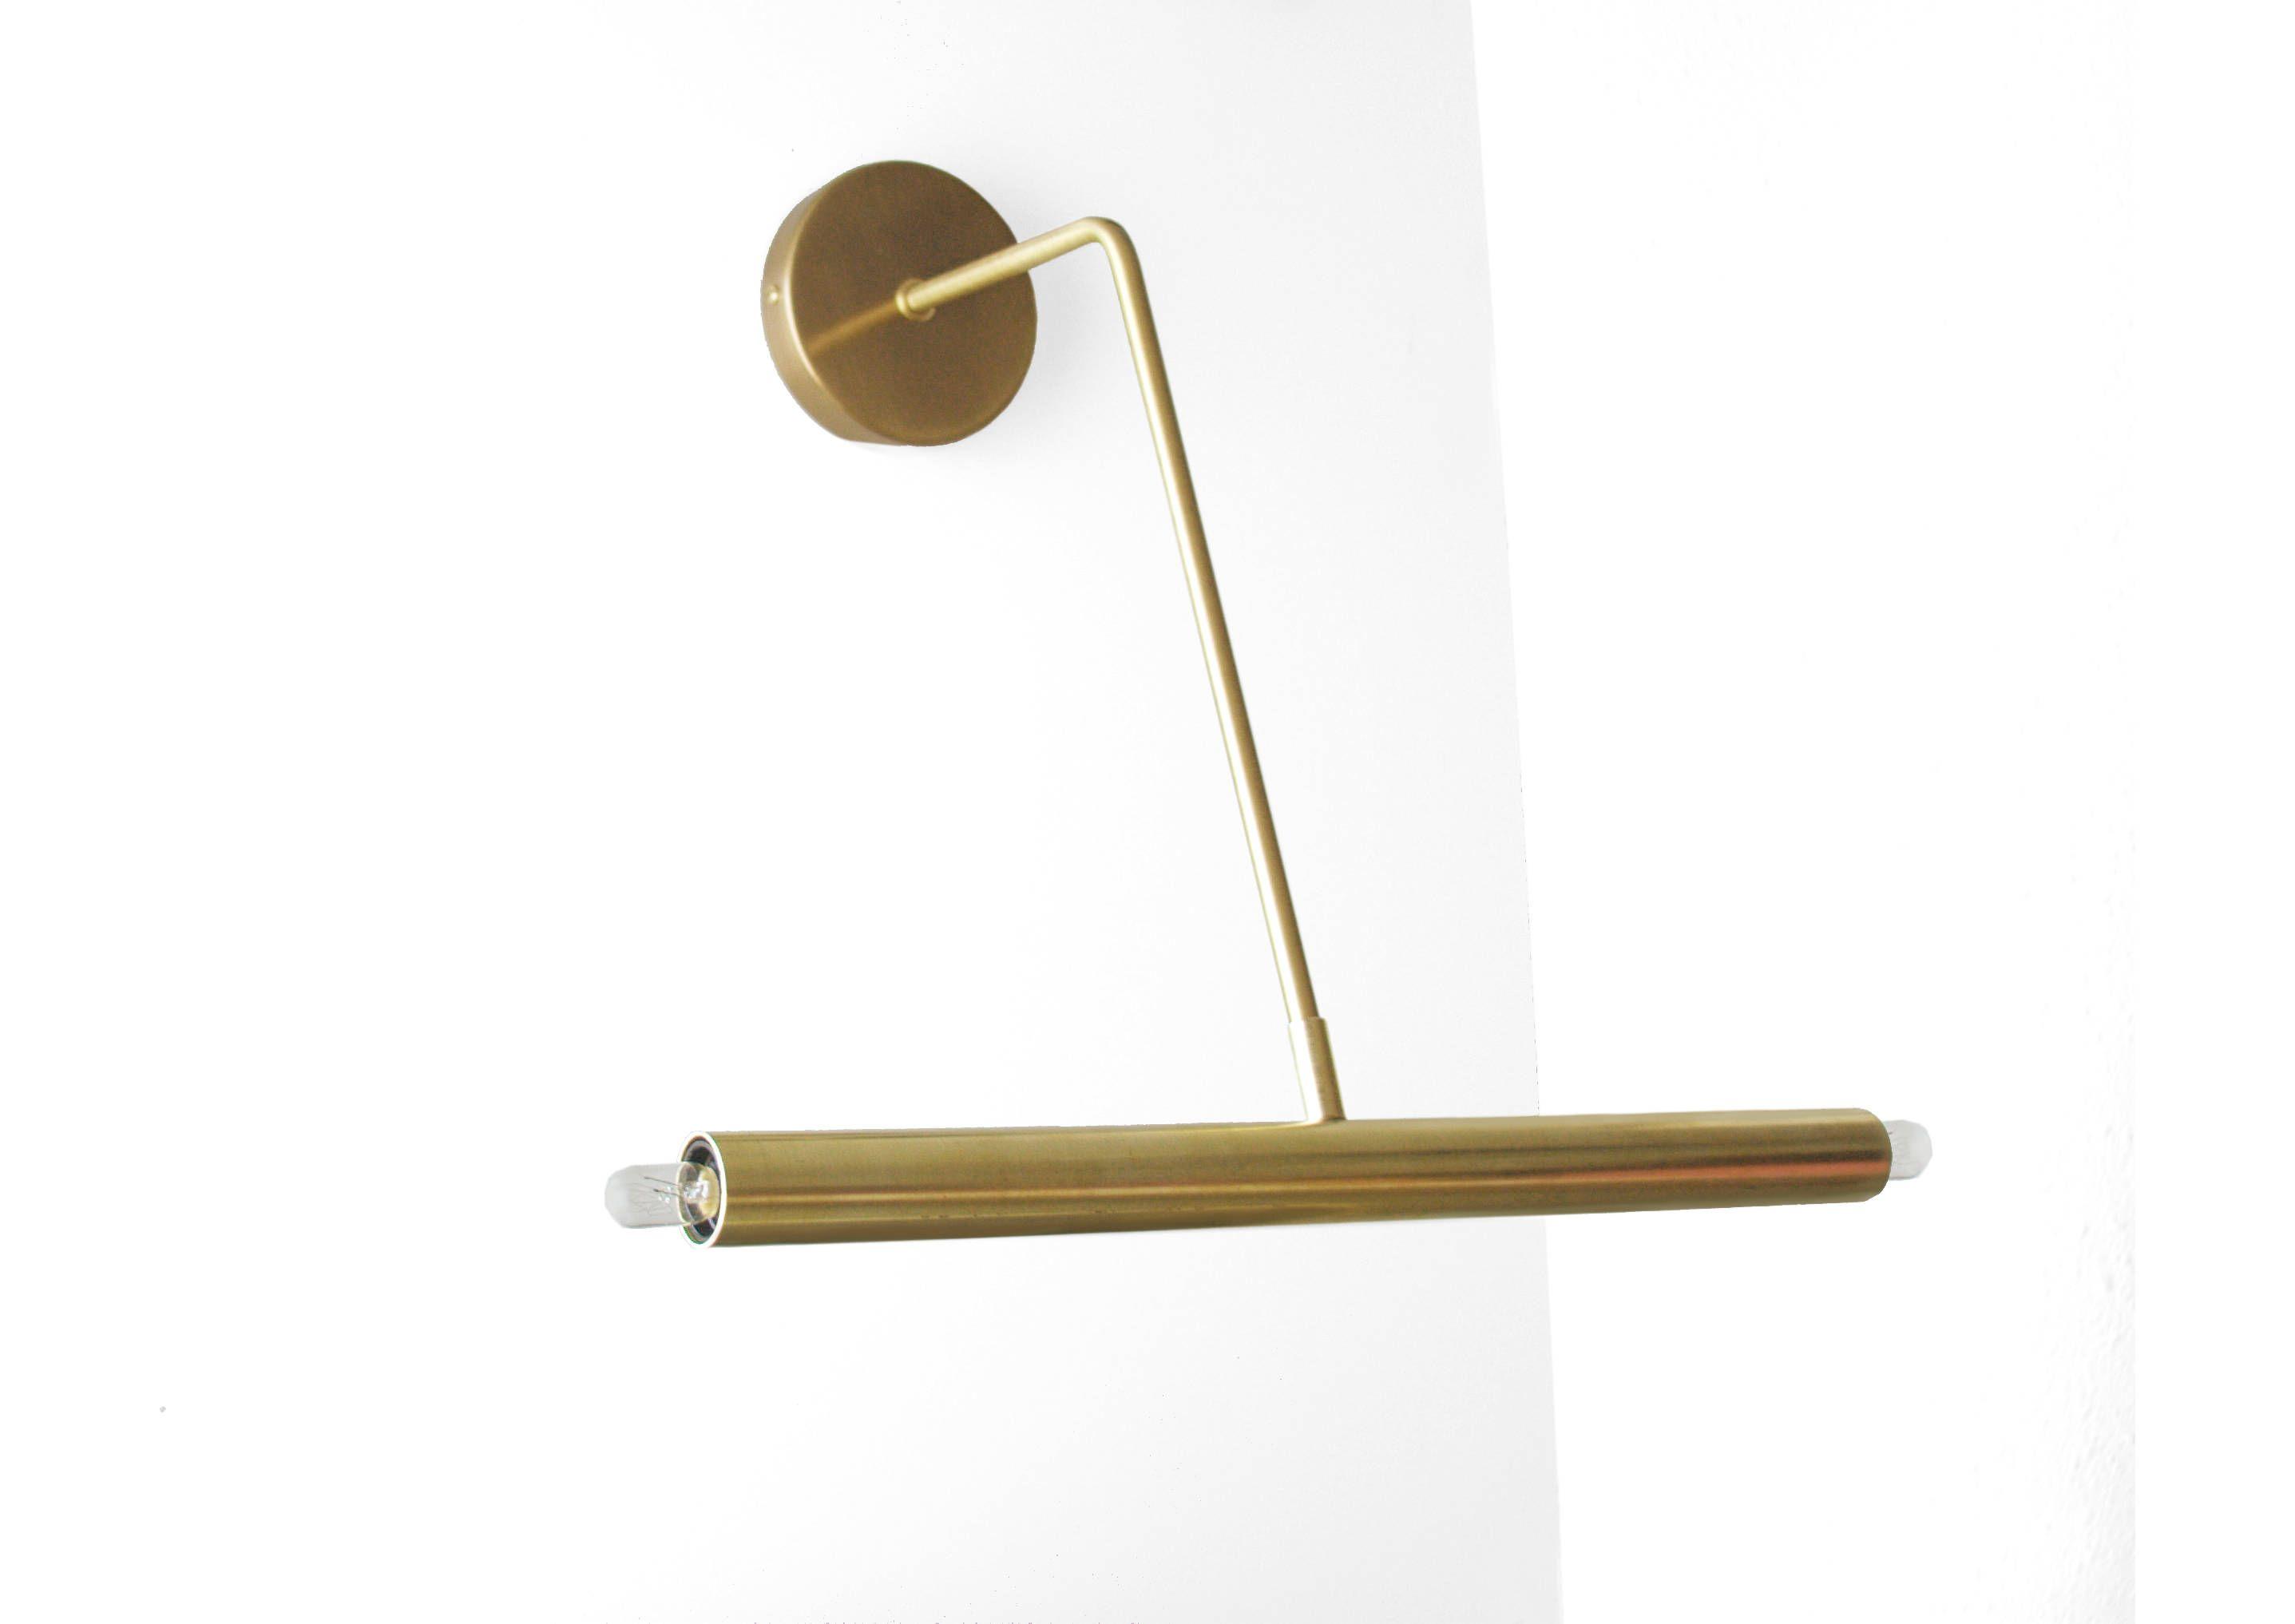 vanity bulb ponz modern light lamp lighting bathroom mid fixture century pin wall